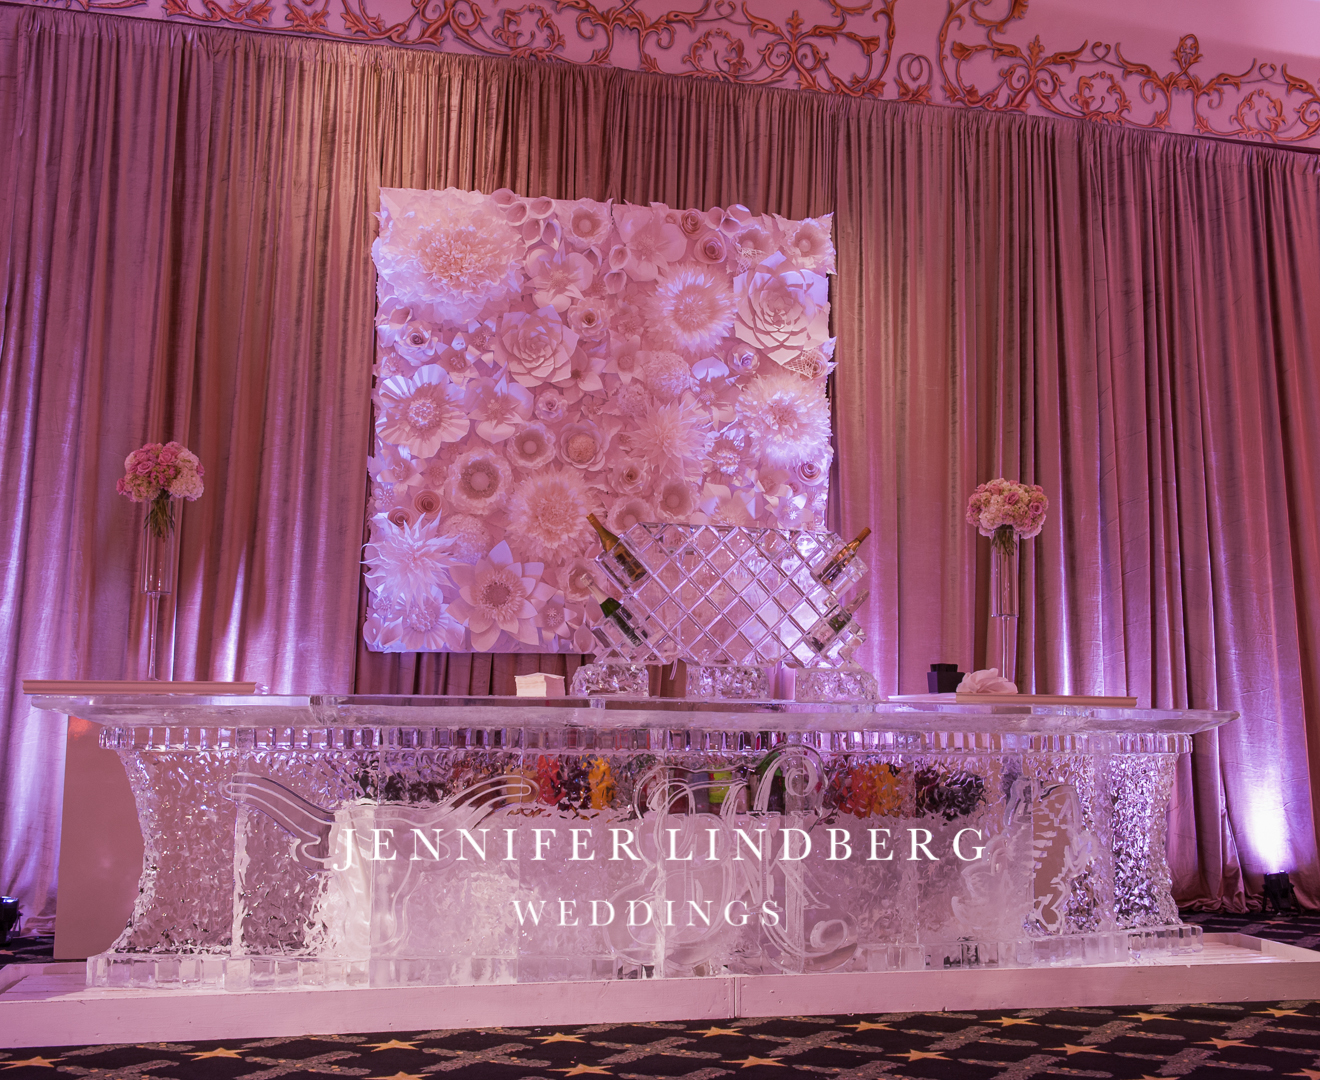 WeddingBarDecoration.jpg